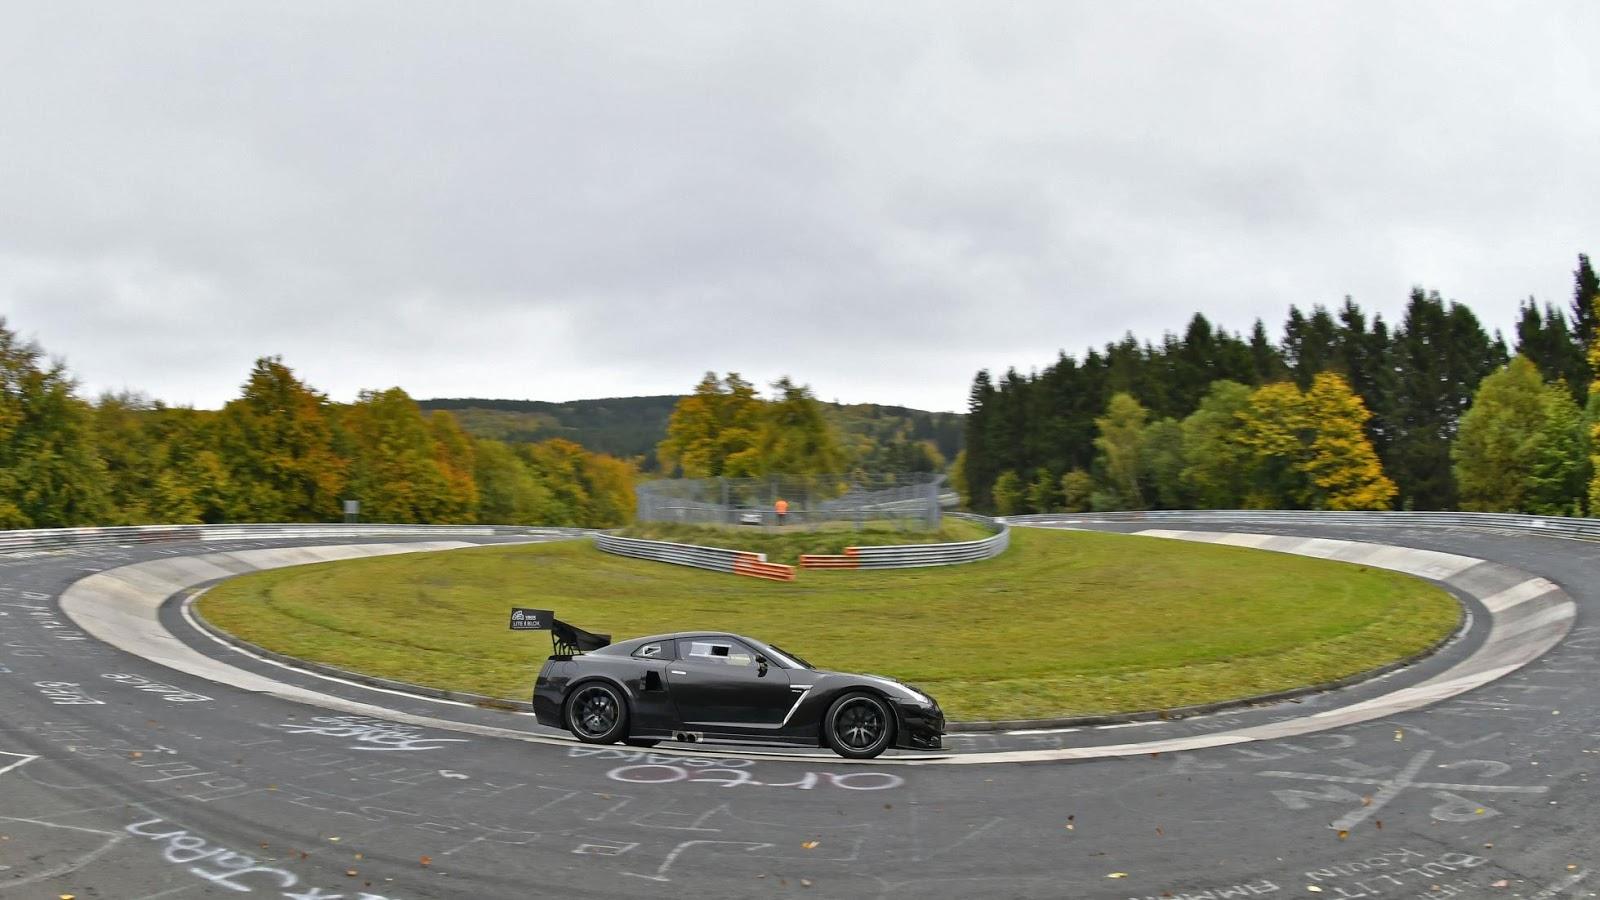 Litchfield-Nissan-GT-R-Nurburgring-12